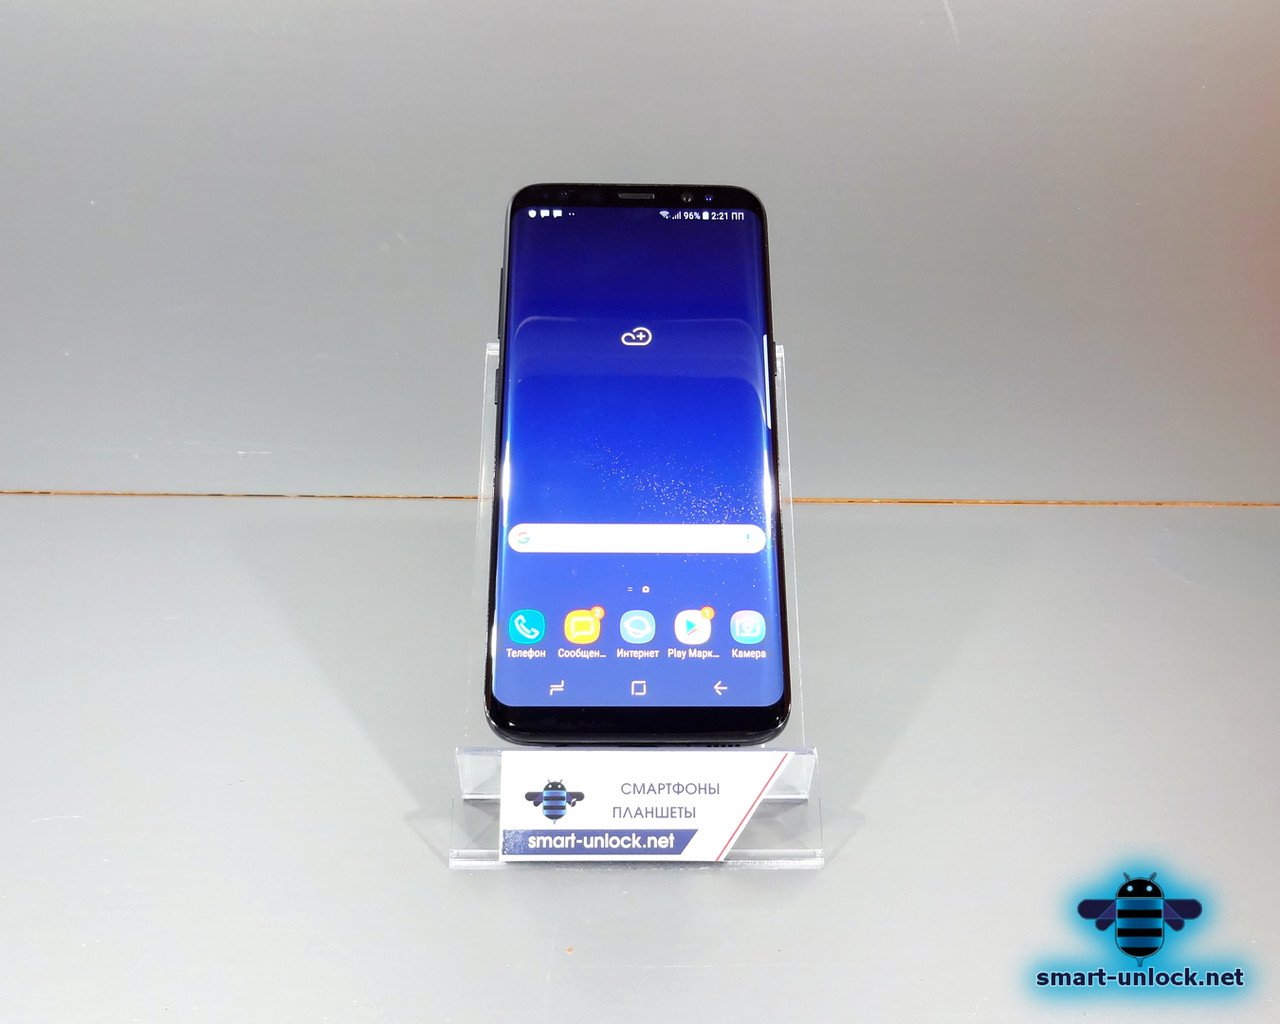 Телефон, смартфон Samsung Galaxy S8 Покупка без риска, гарантия!